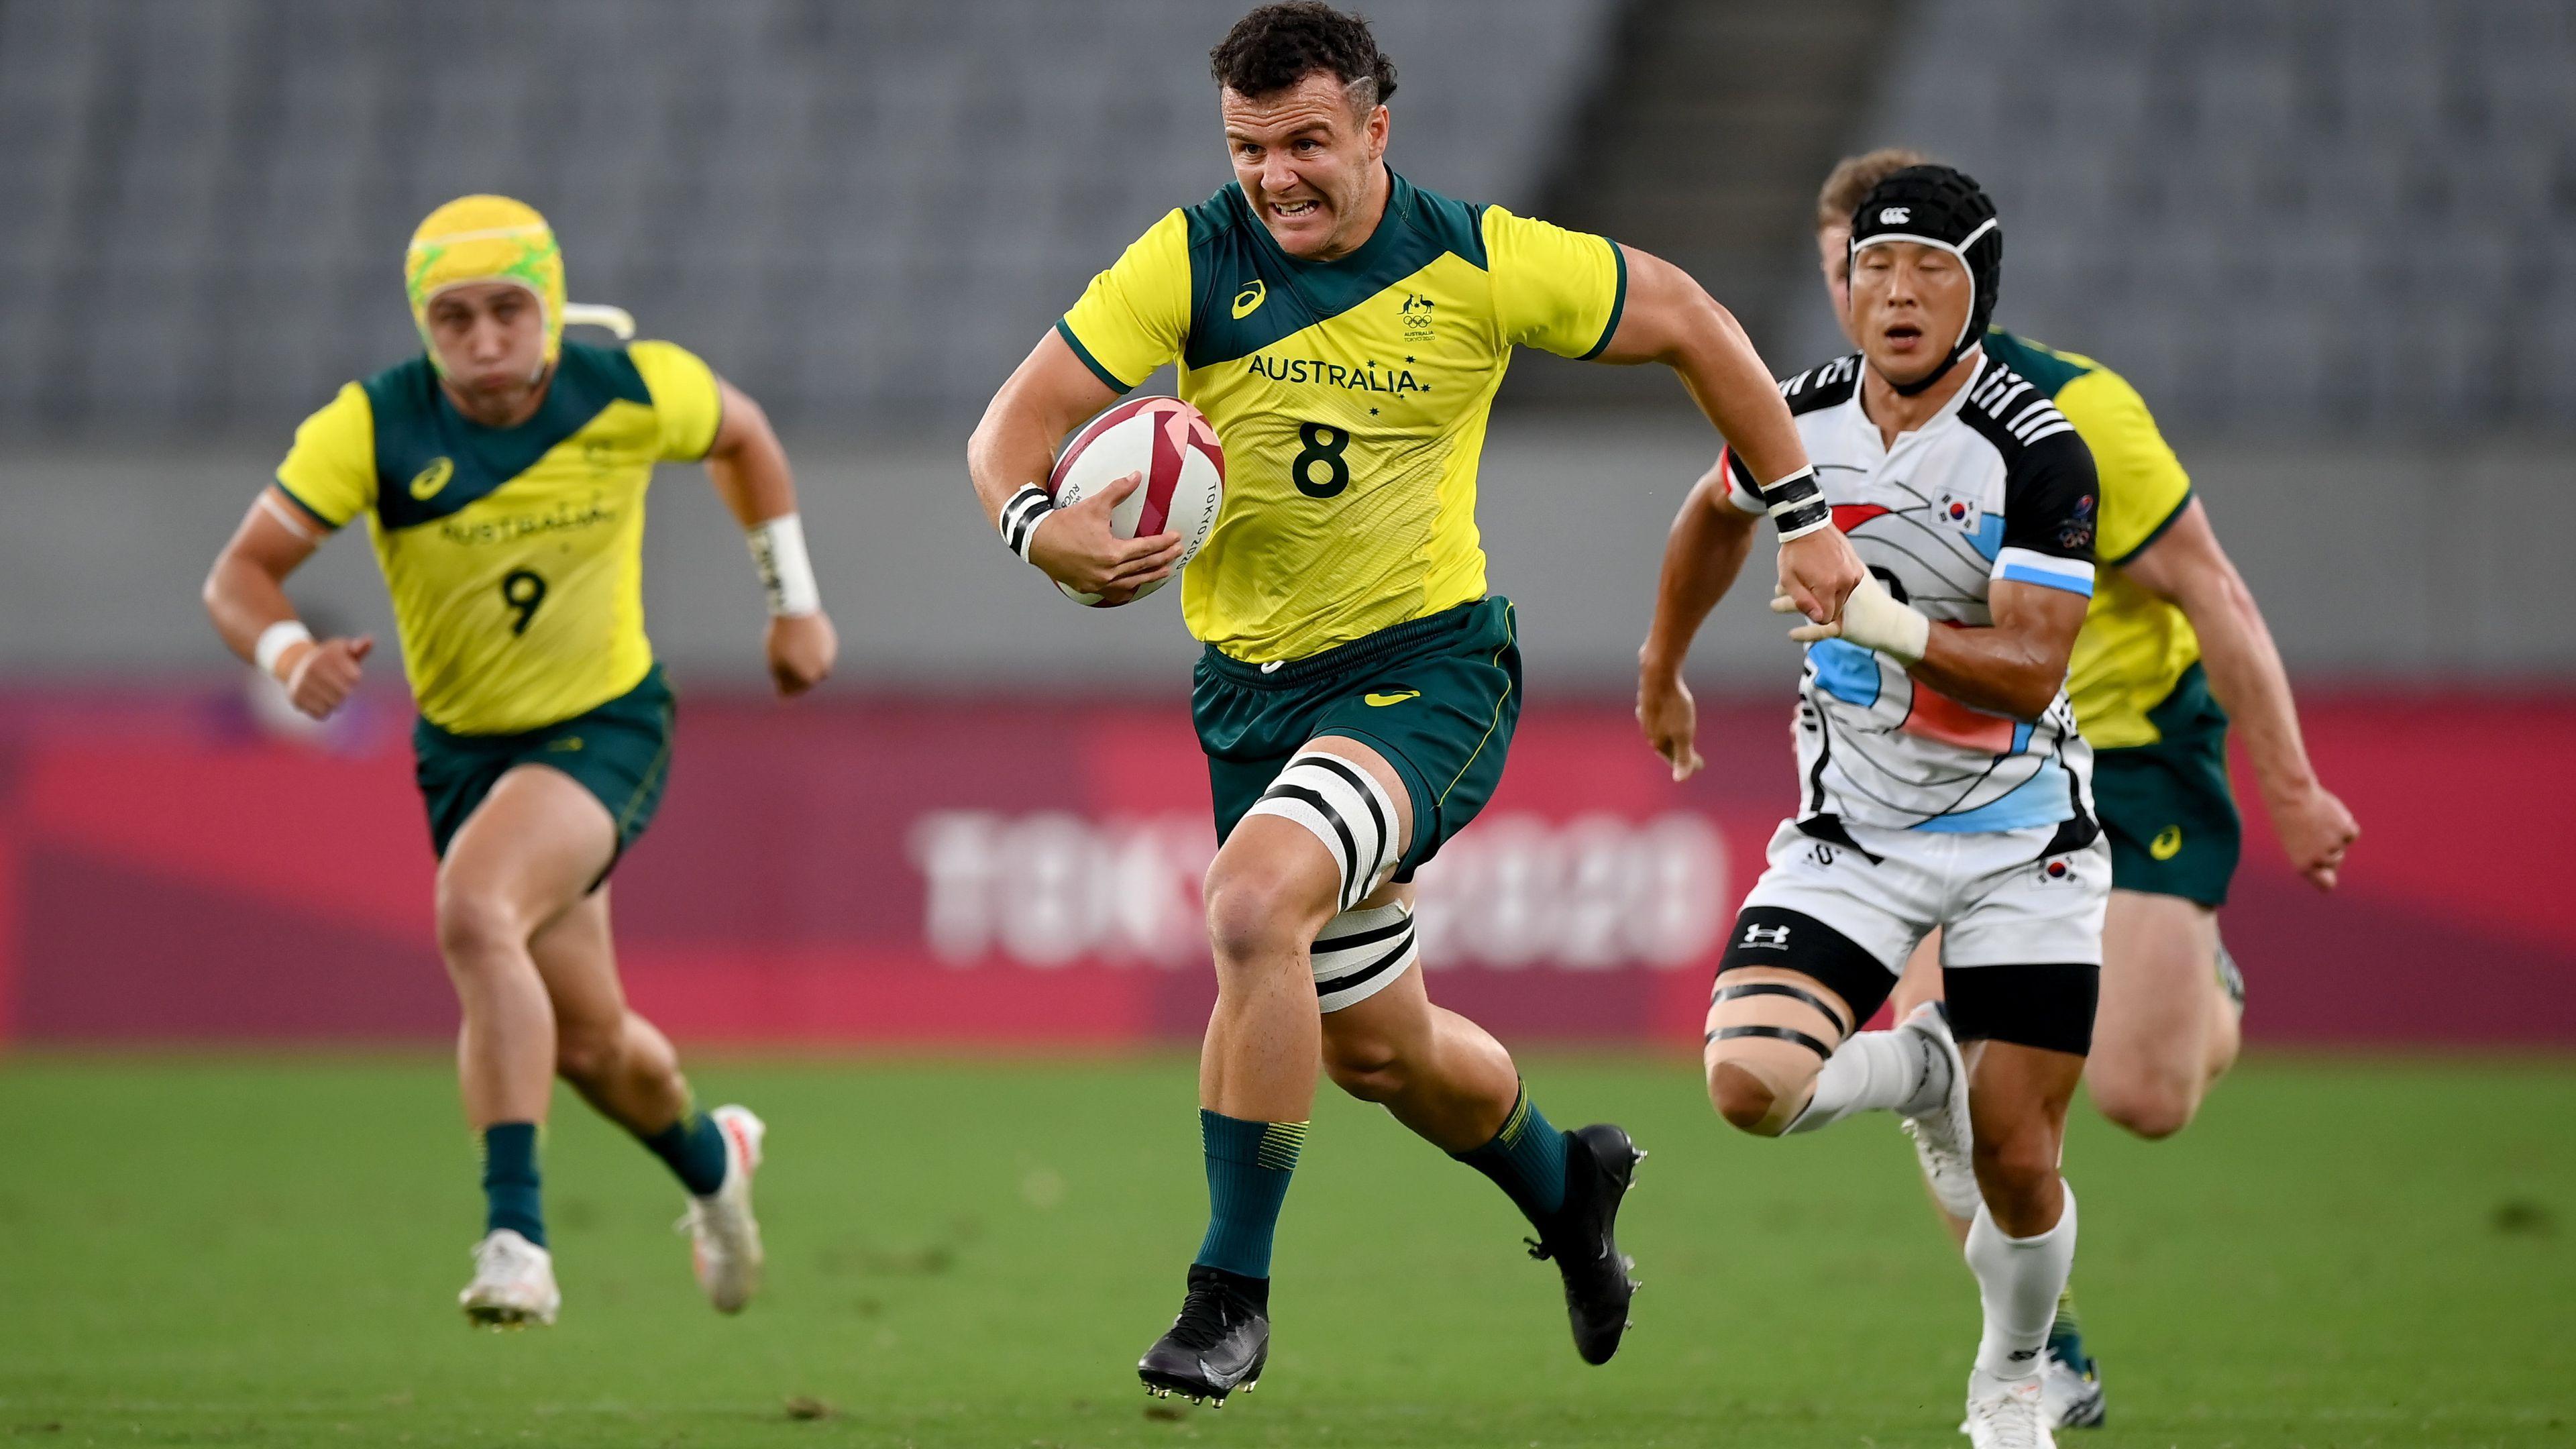 Tokyo Olympics 2021: Aussie sevens team face daunting task to beat Kiwis and ensure quarter-final berth